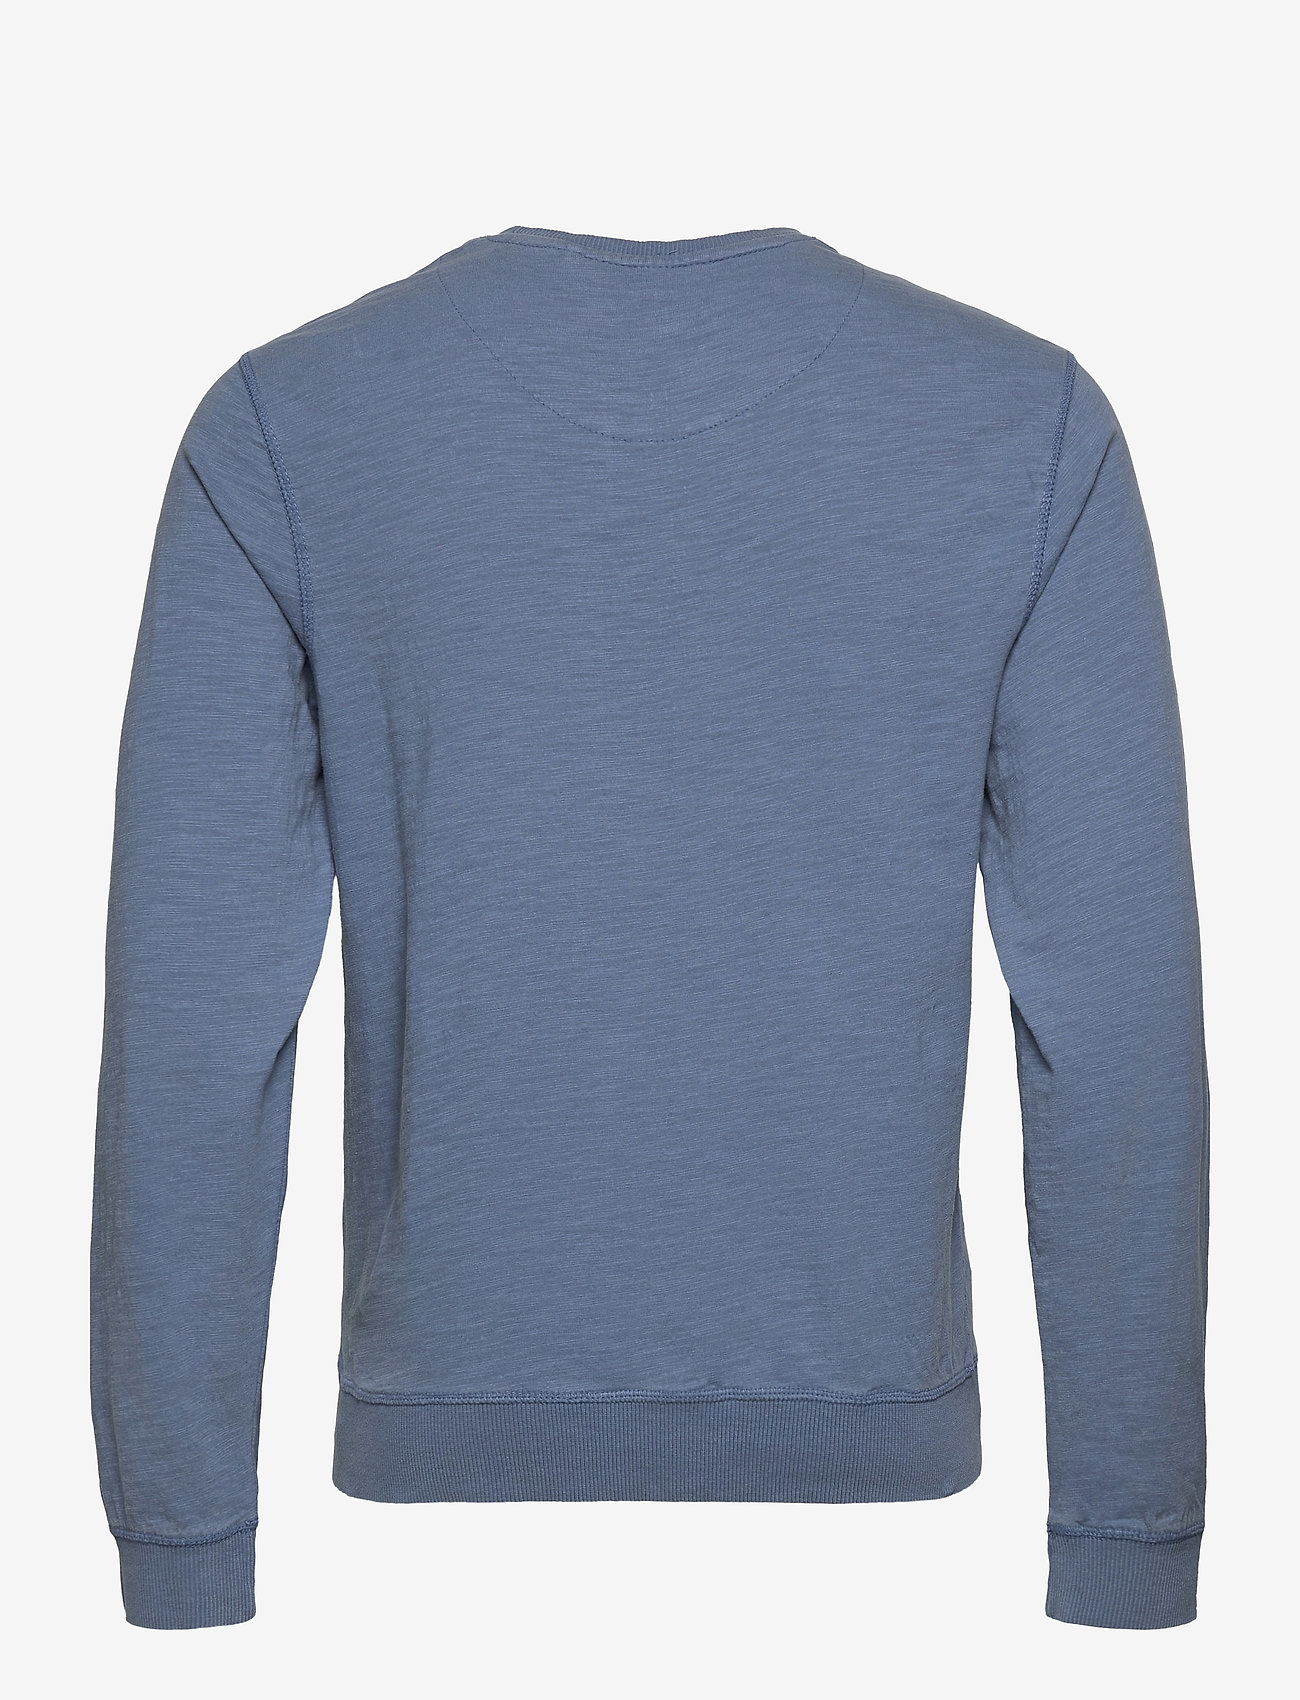 Blend - Sweatshirt - truien - moonlight blue - 1